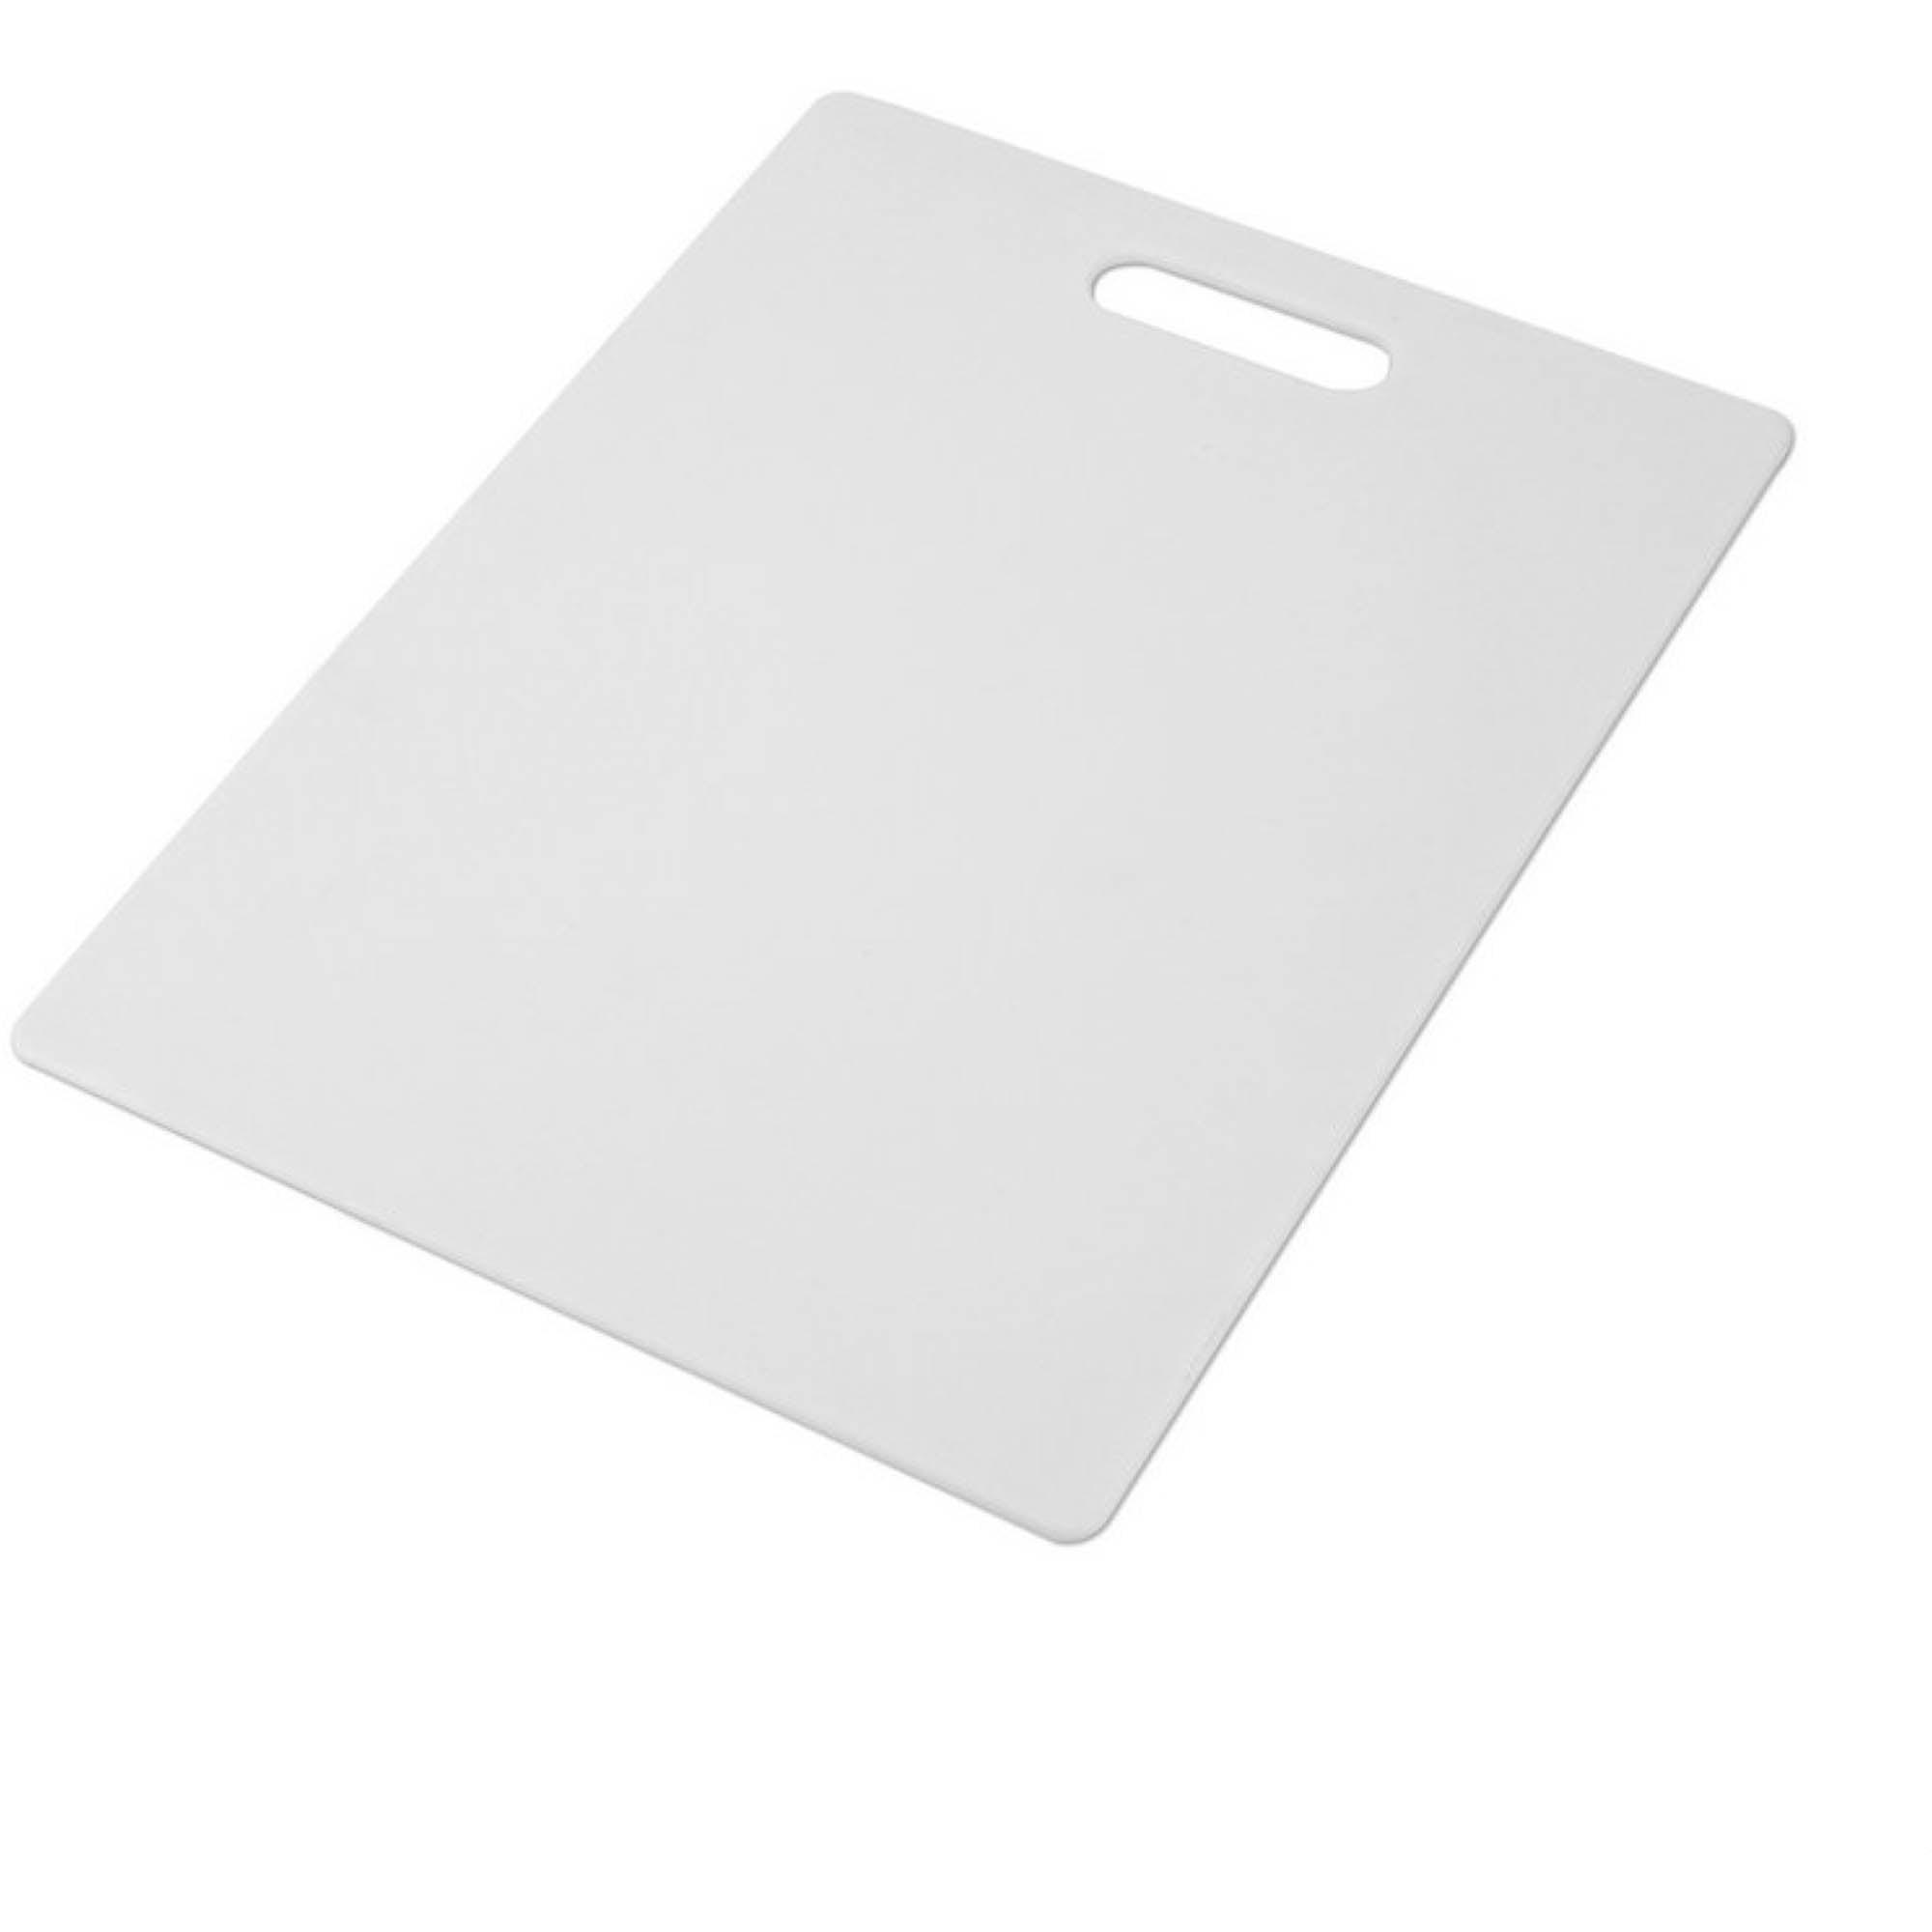 Farberware 11 inch By 14 inch White Poly Cutting Board